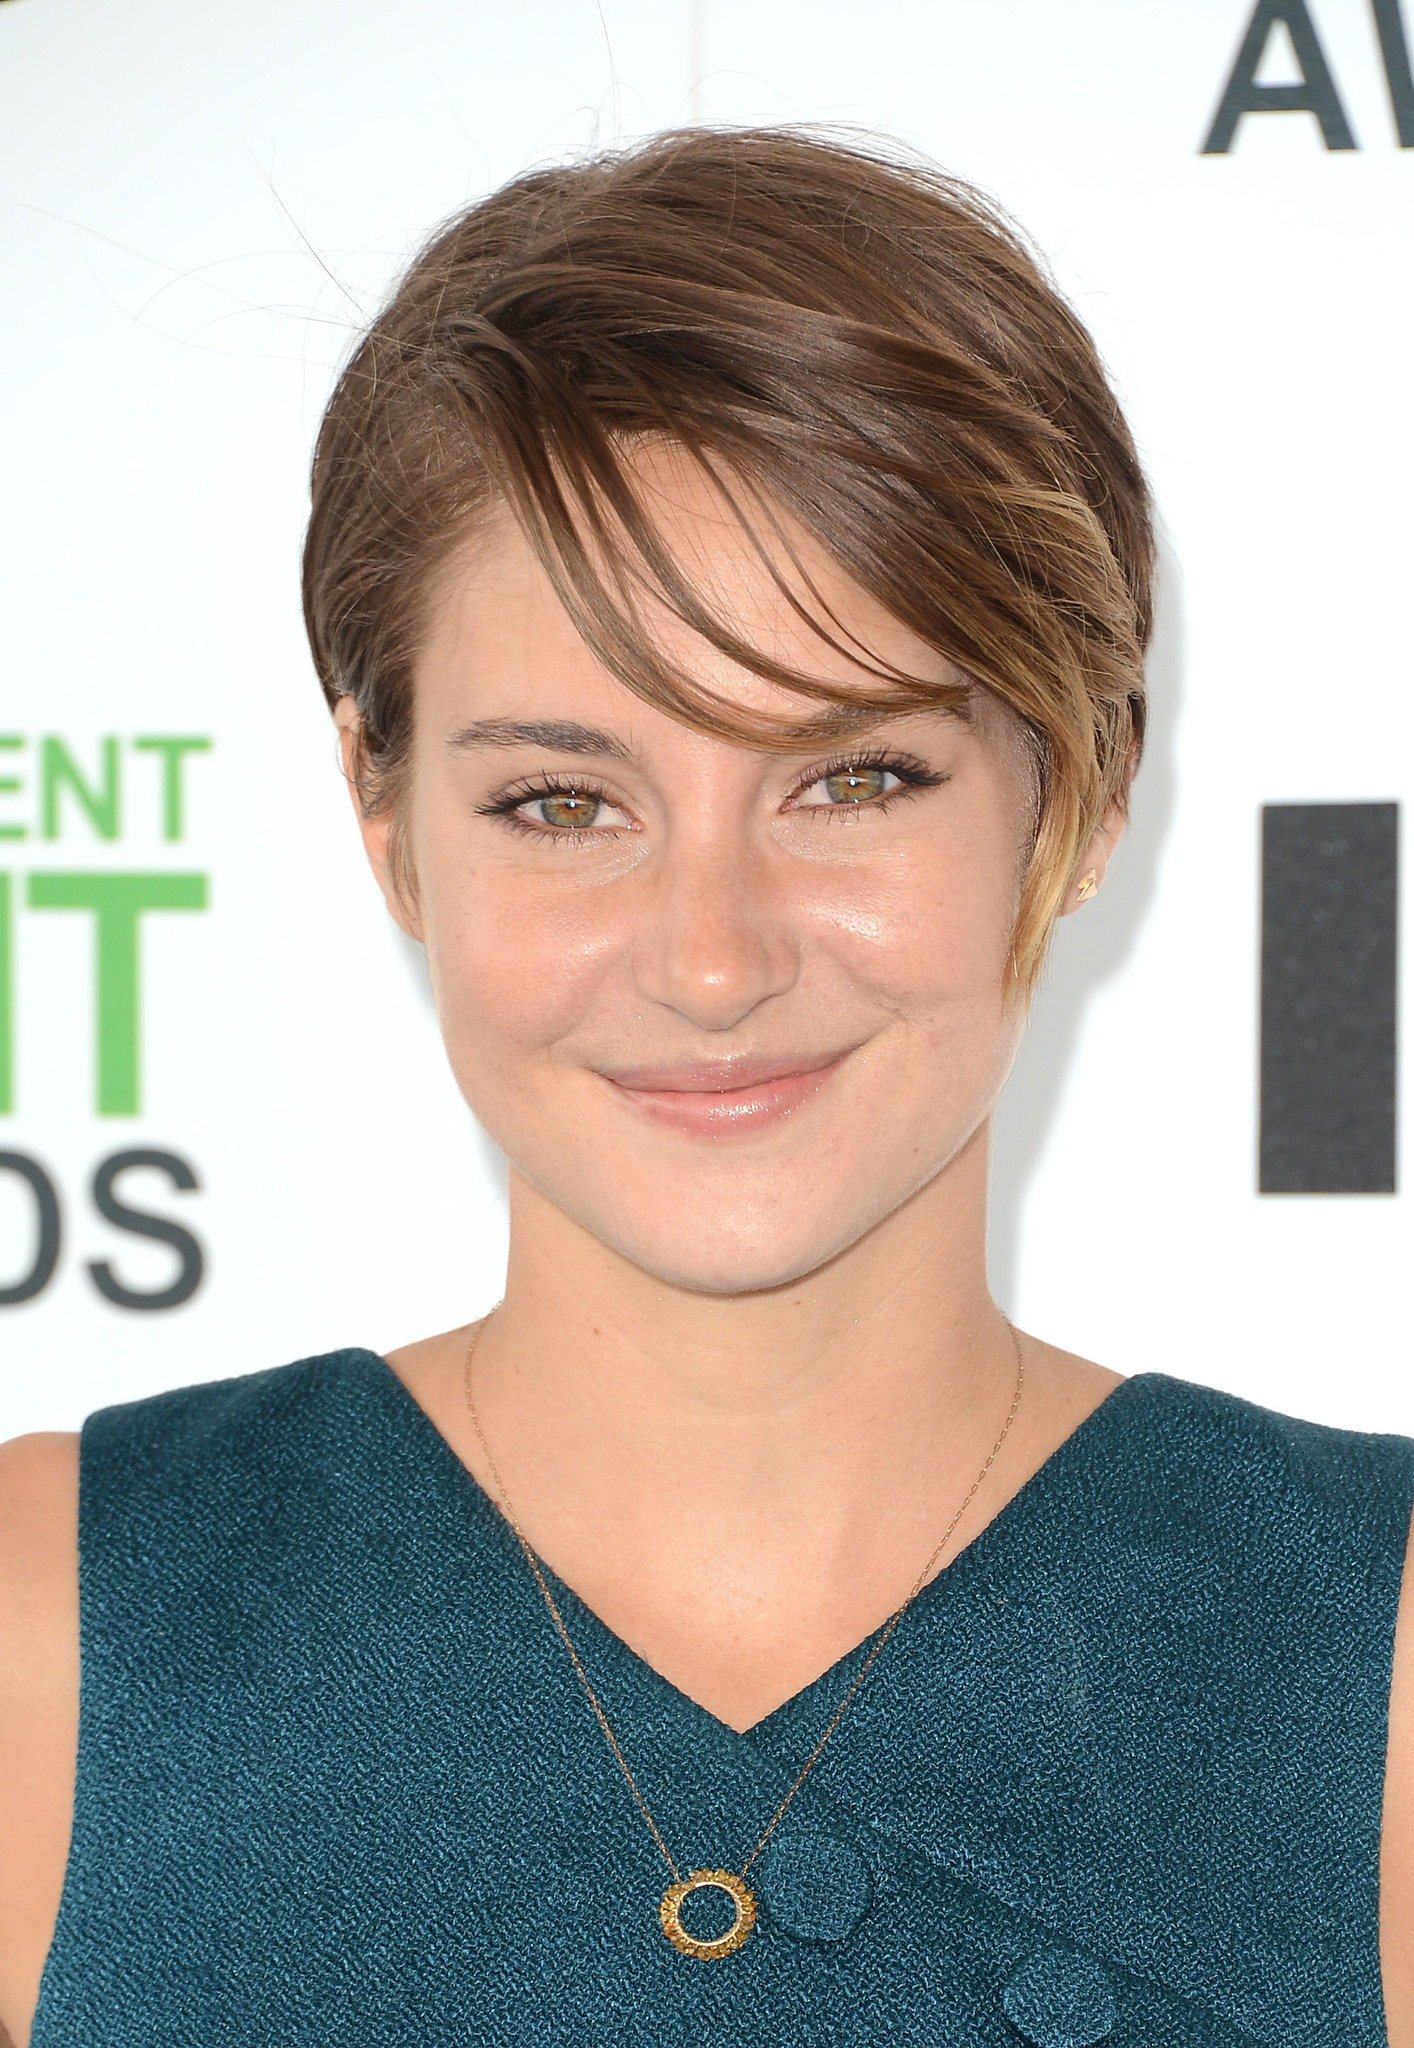 Shailene Woodley | Stars Show Off Brunch Beauty Looks at